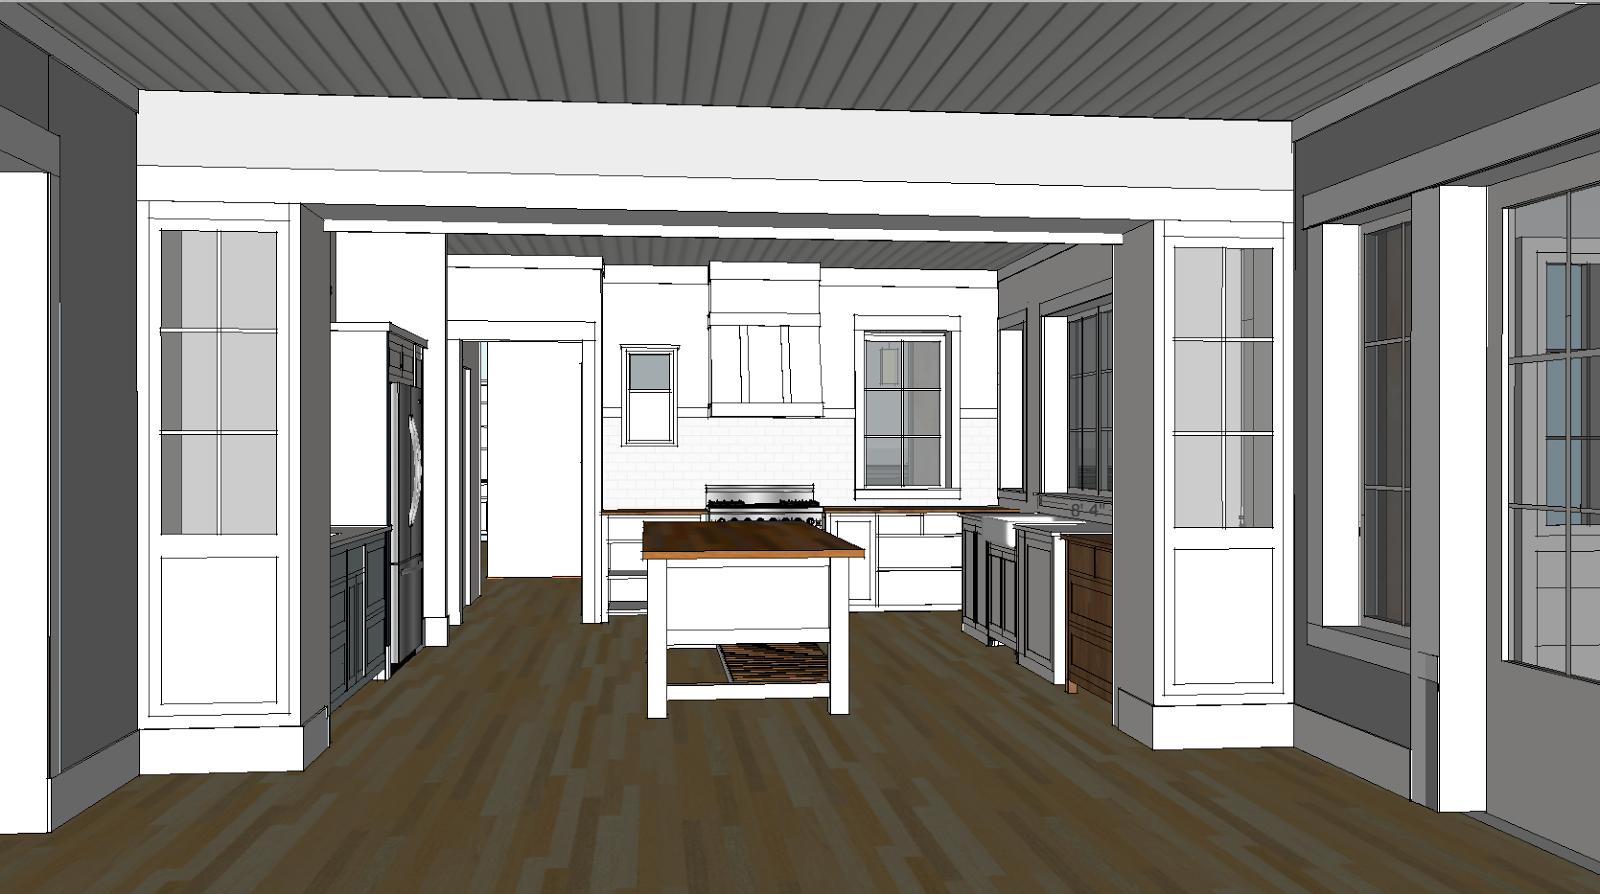 Solstice Cottage: Kitchen Design